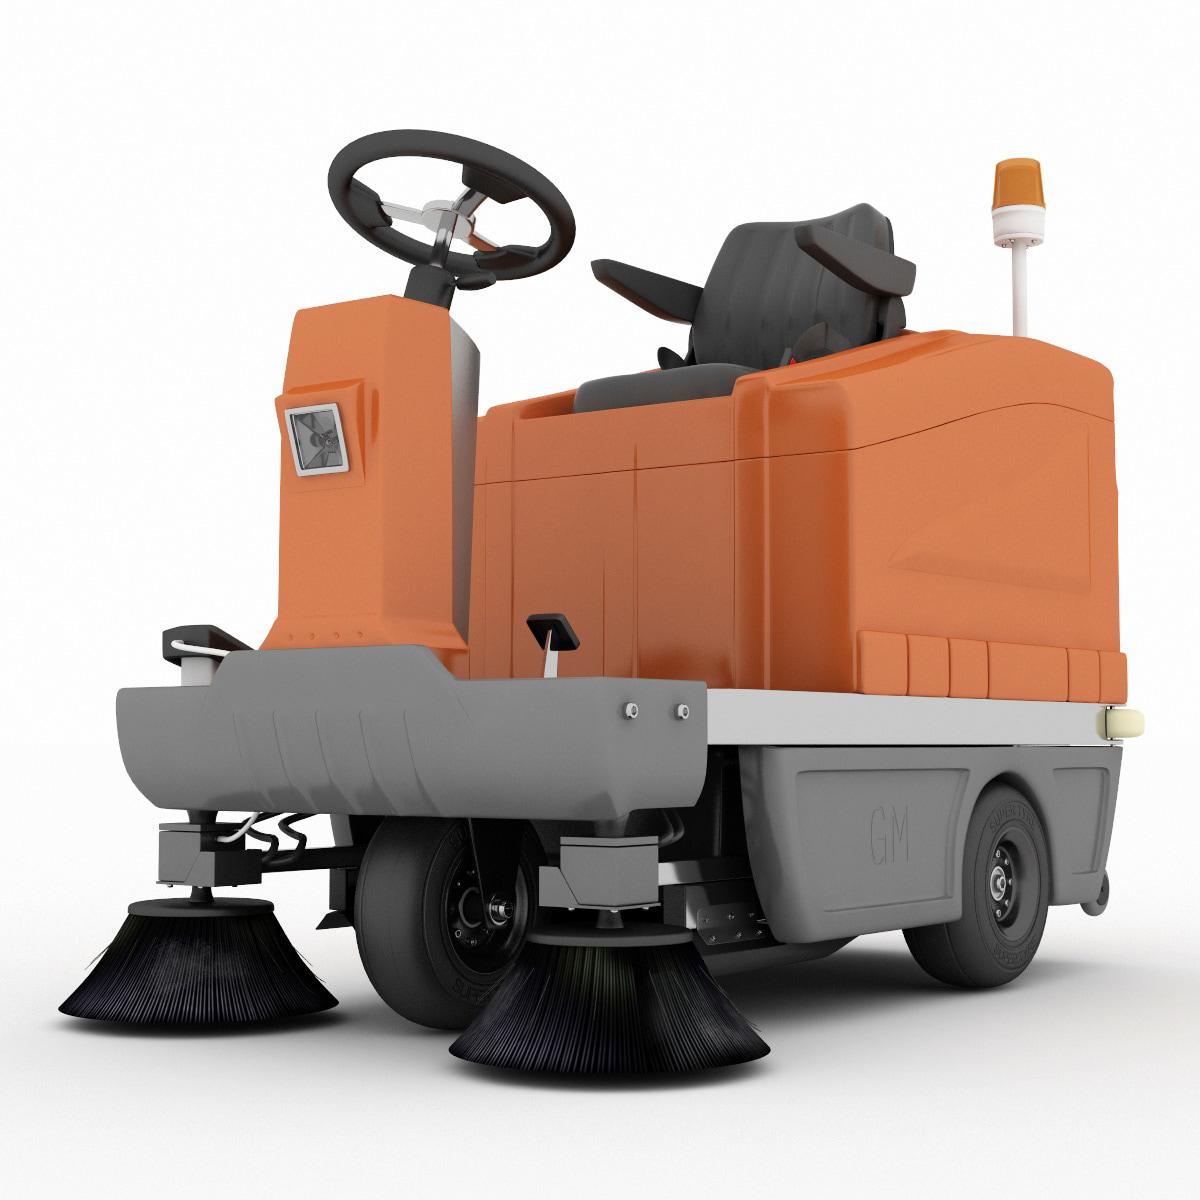 Electric_Sweeping_Car_GM_SS1300l_00.jpg